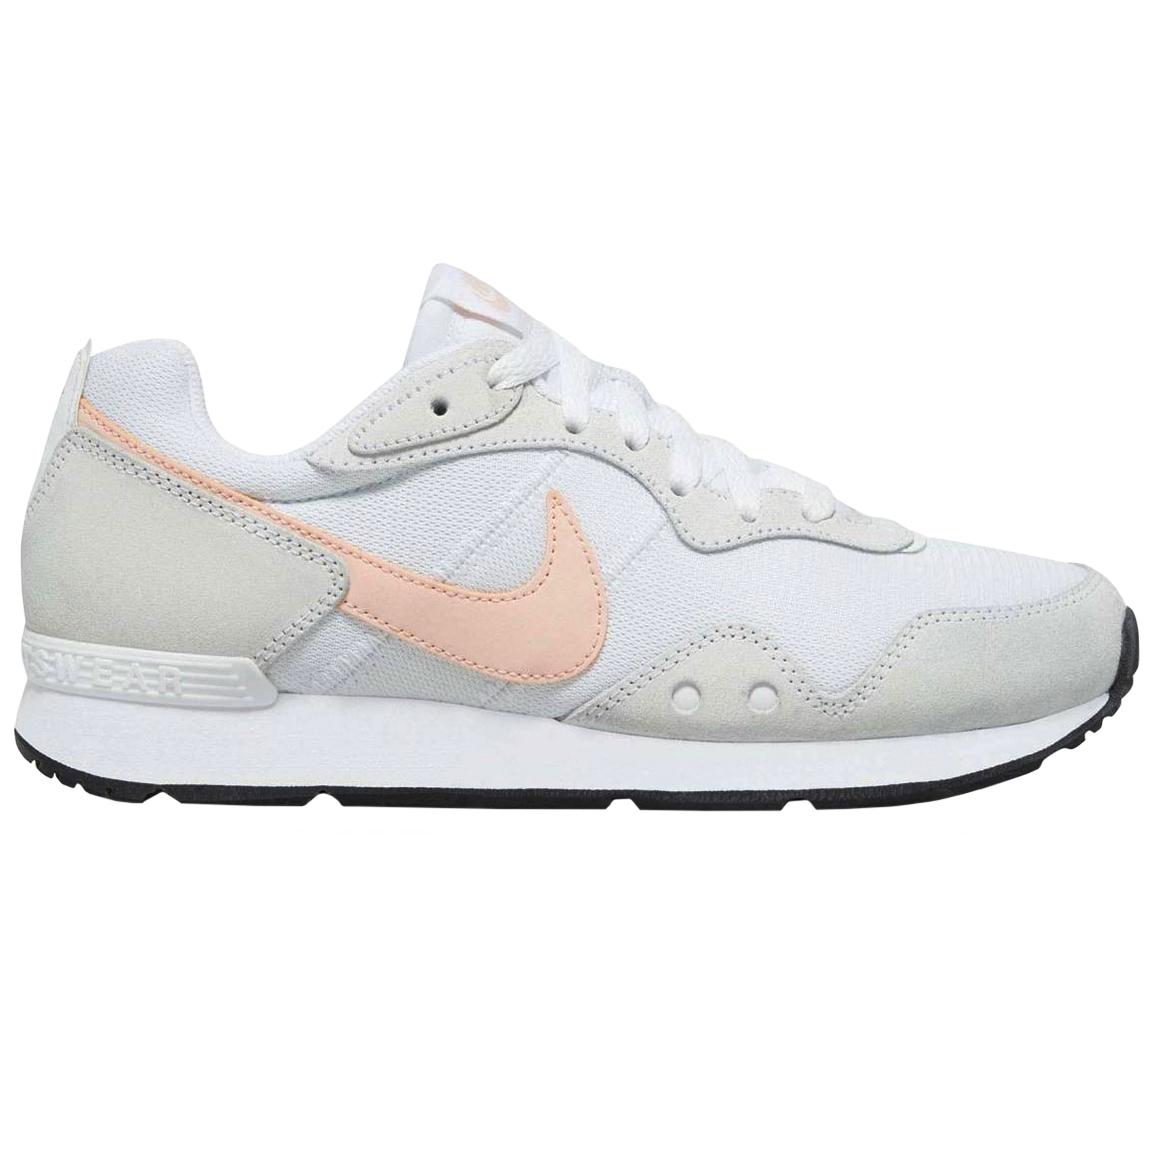 Nike WMNS Venture Runner Retro Sneaker weiß coral